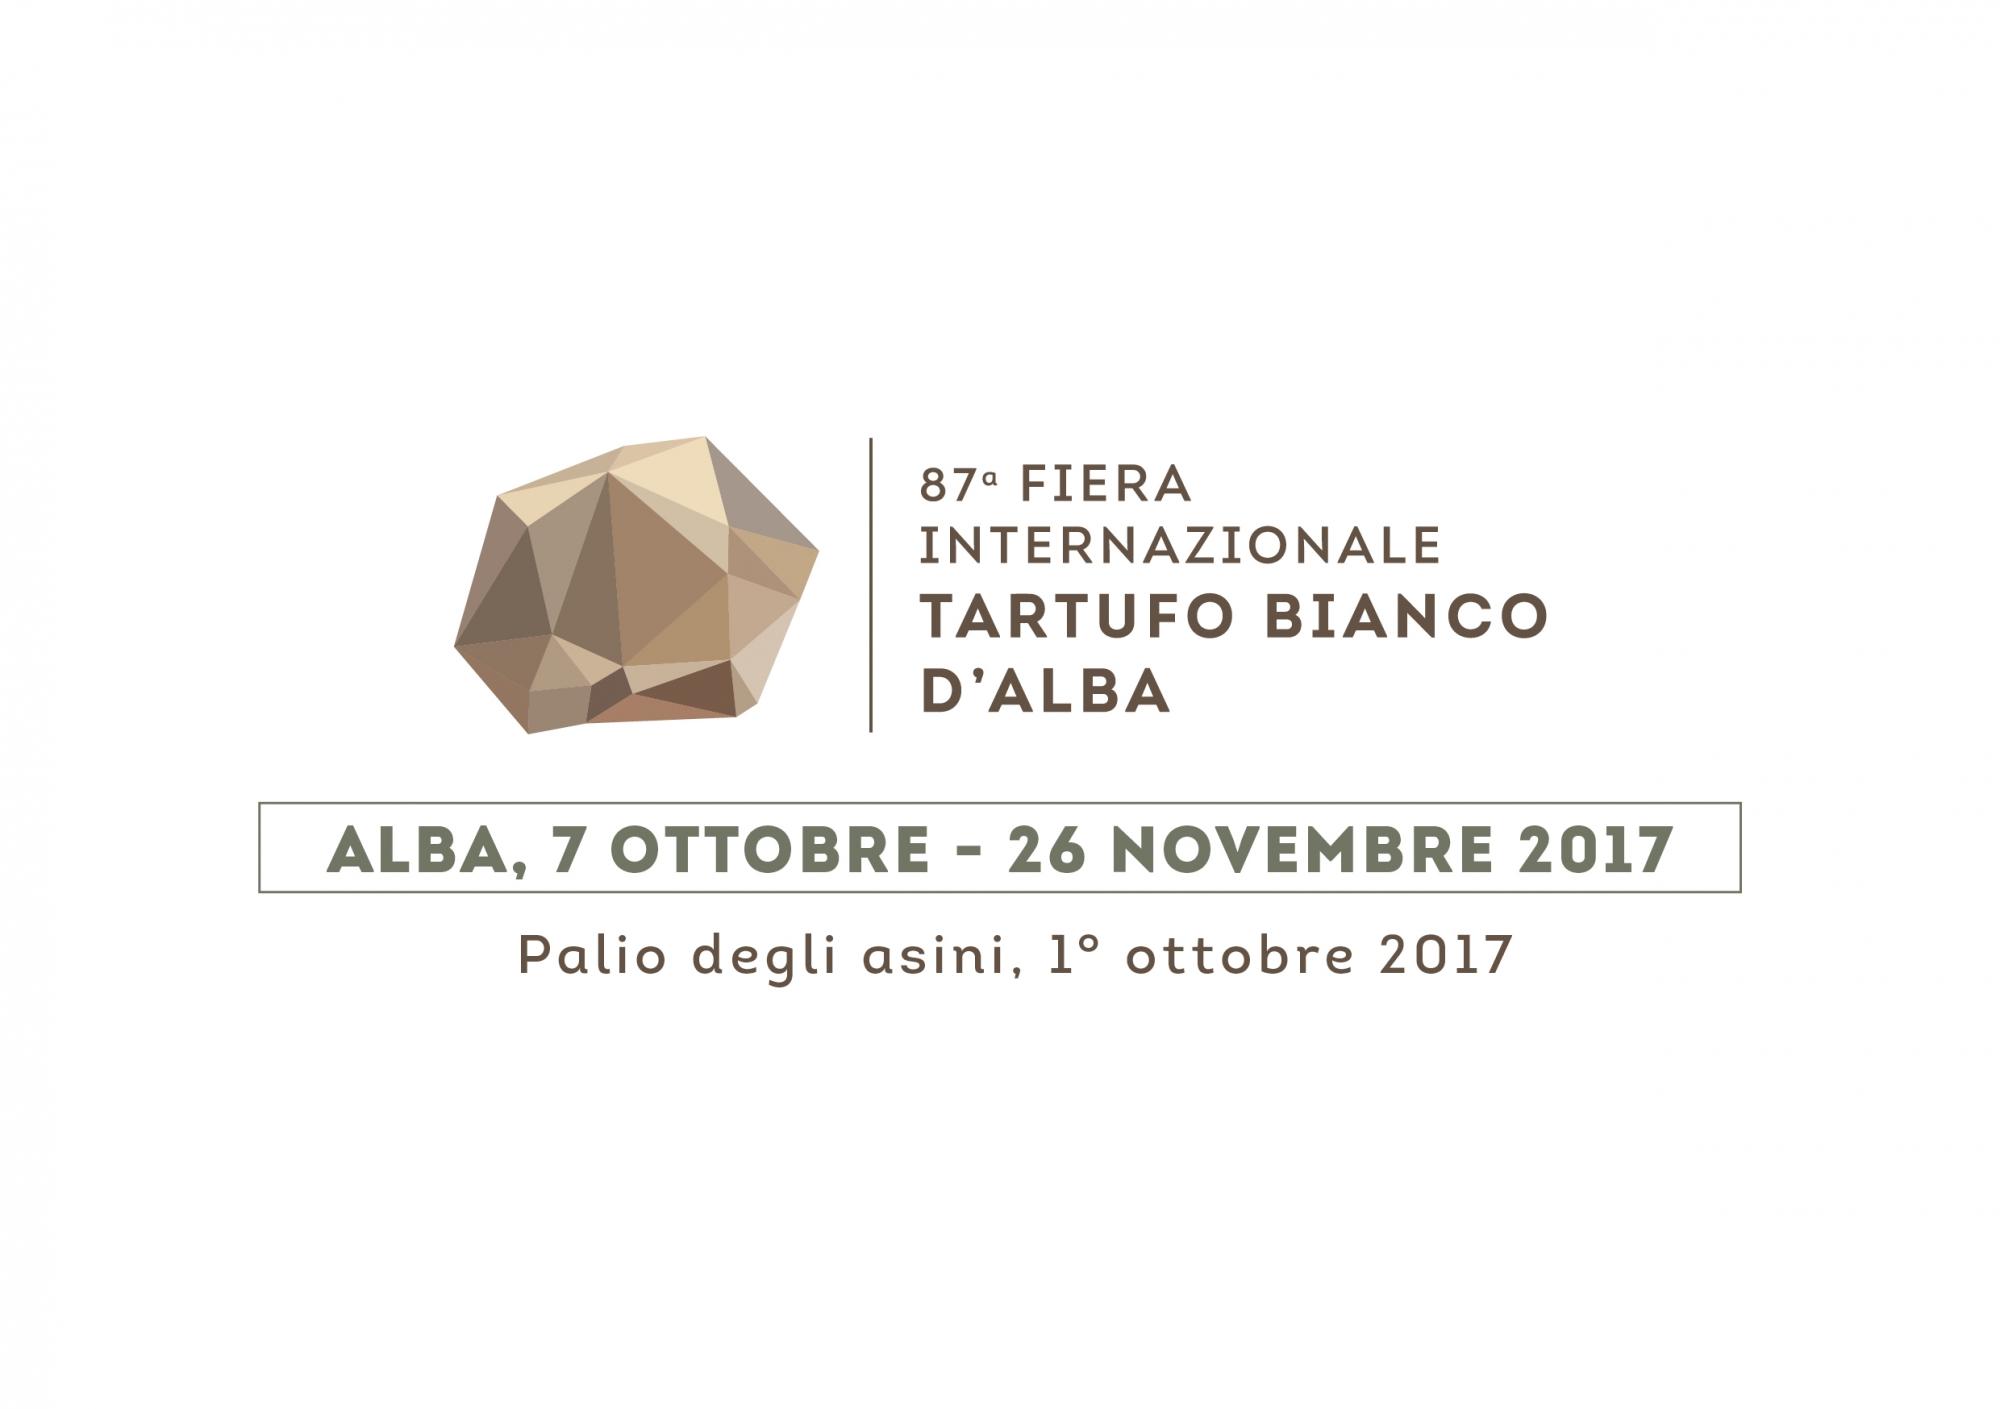 Fiera Internazionale tartufo bianco d'Alba 2017